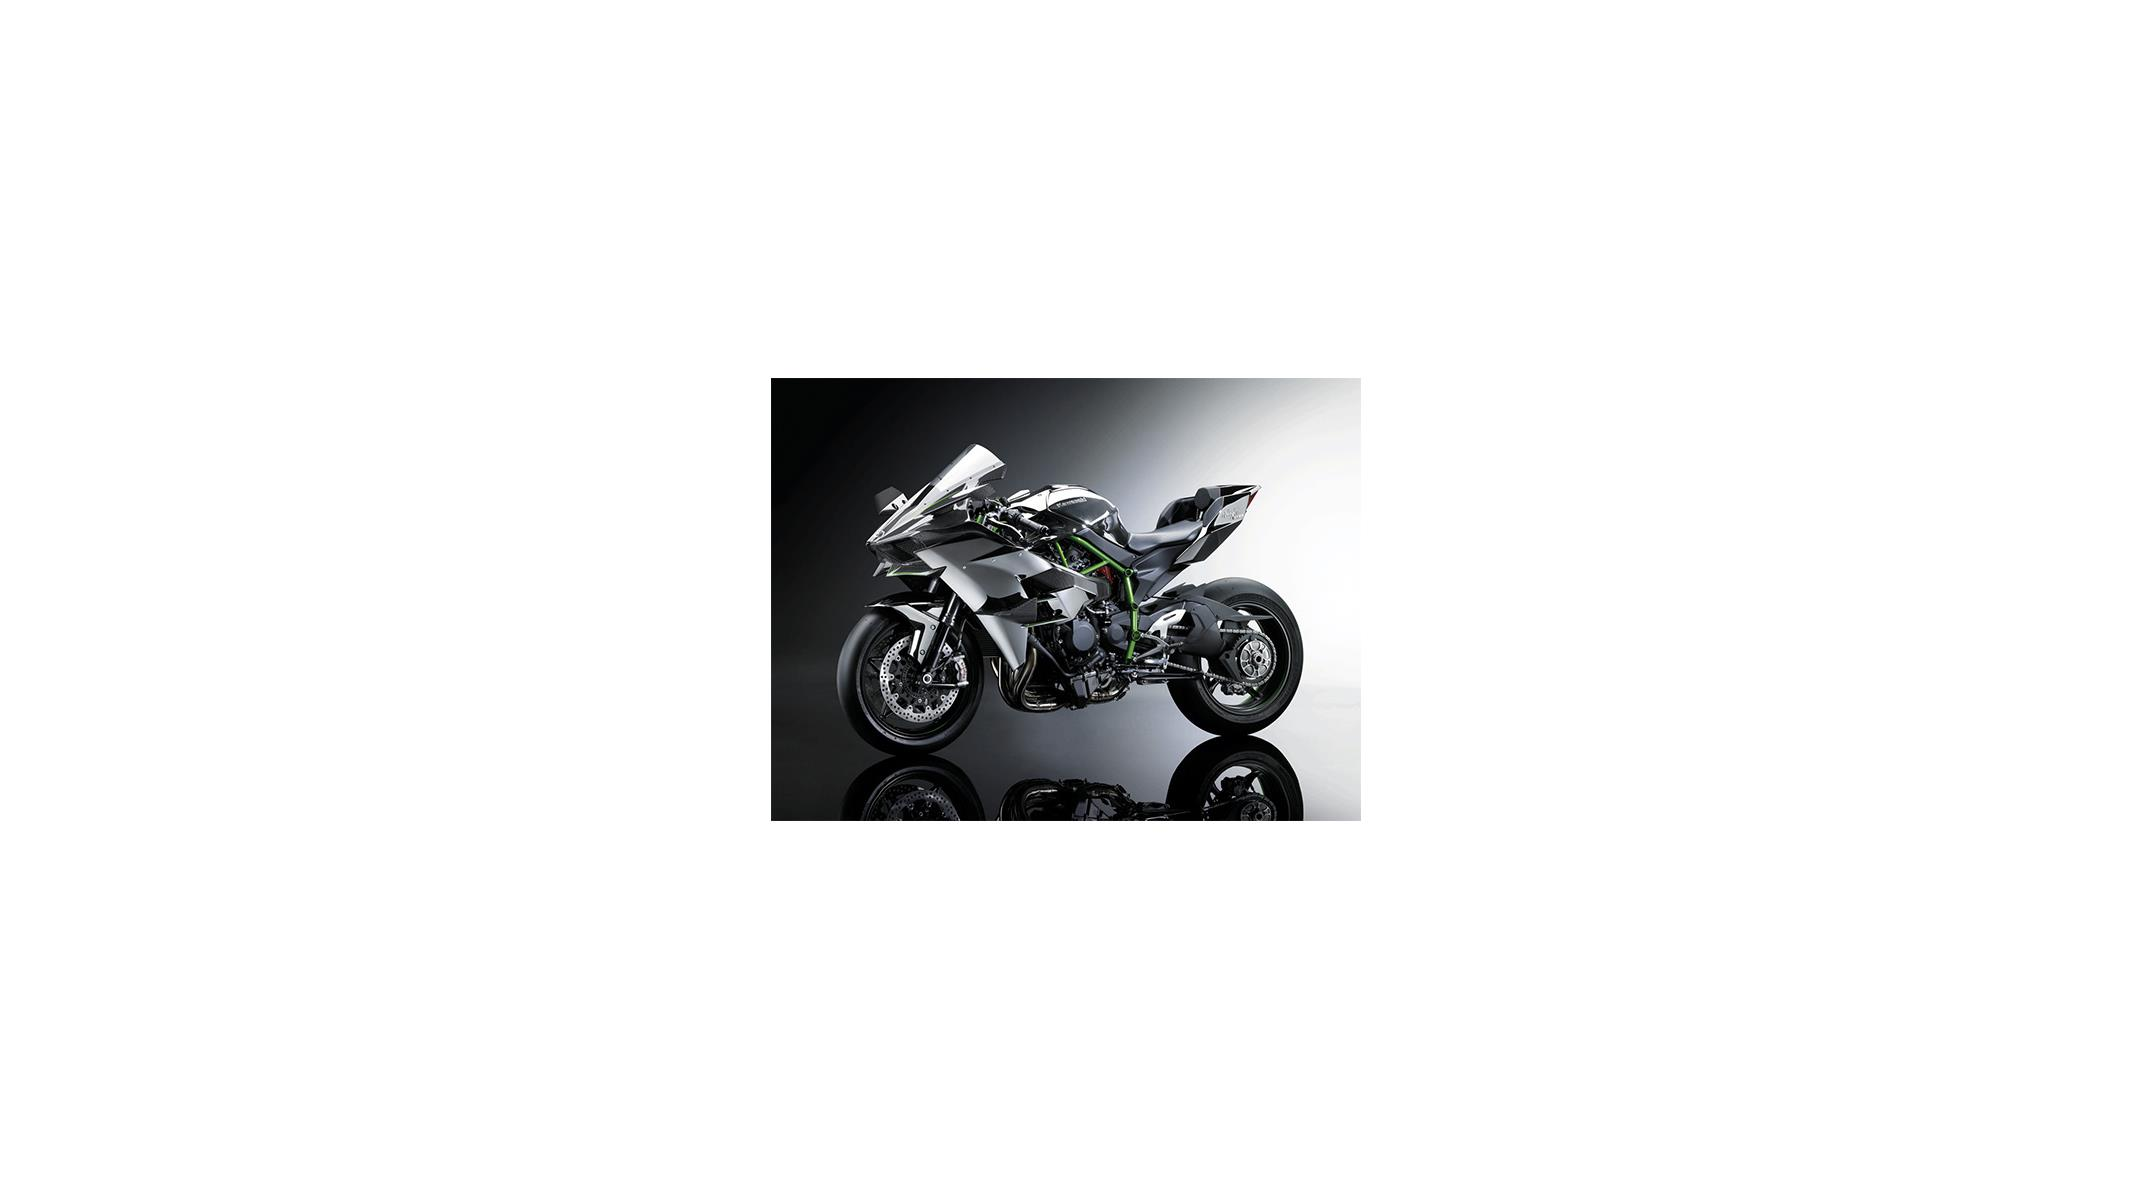 Kawasaki's Latest Crotch Rocket Ninja Super Bike Is So Power